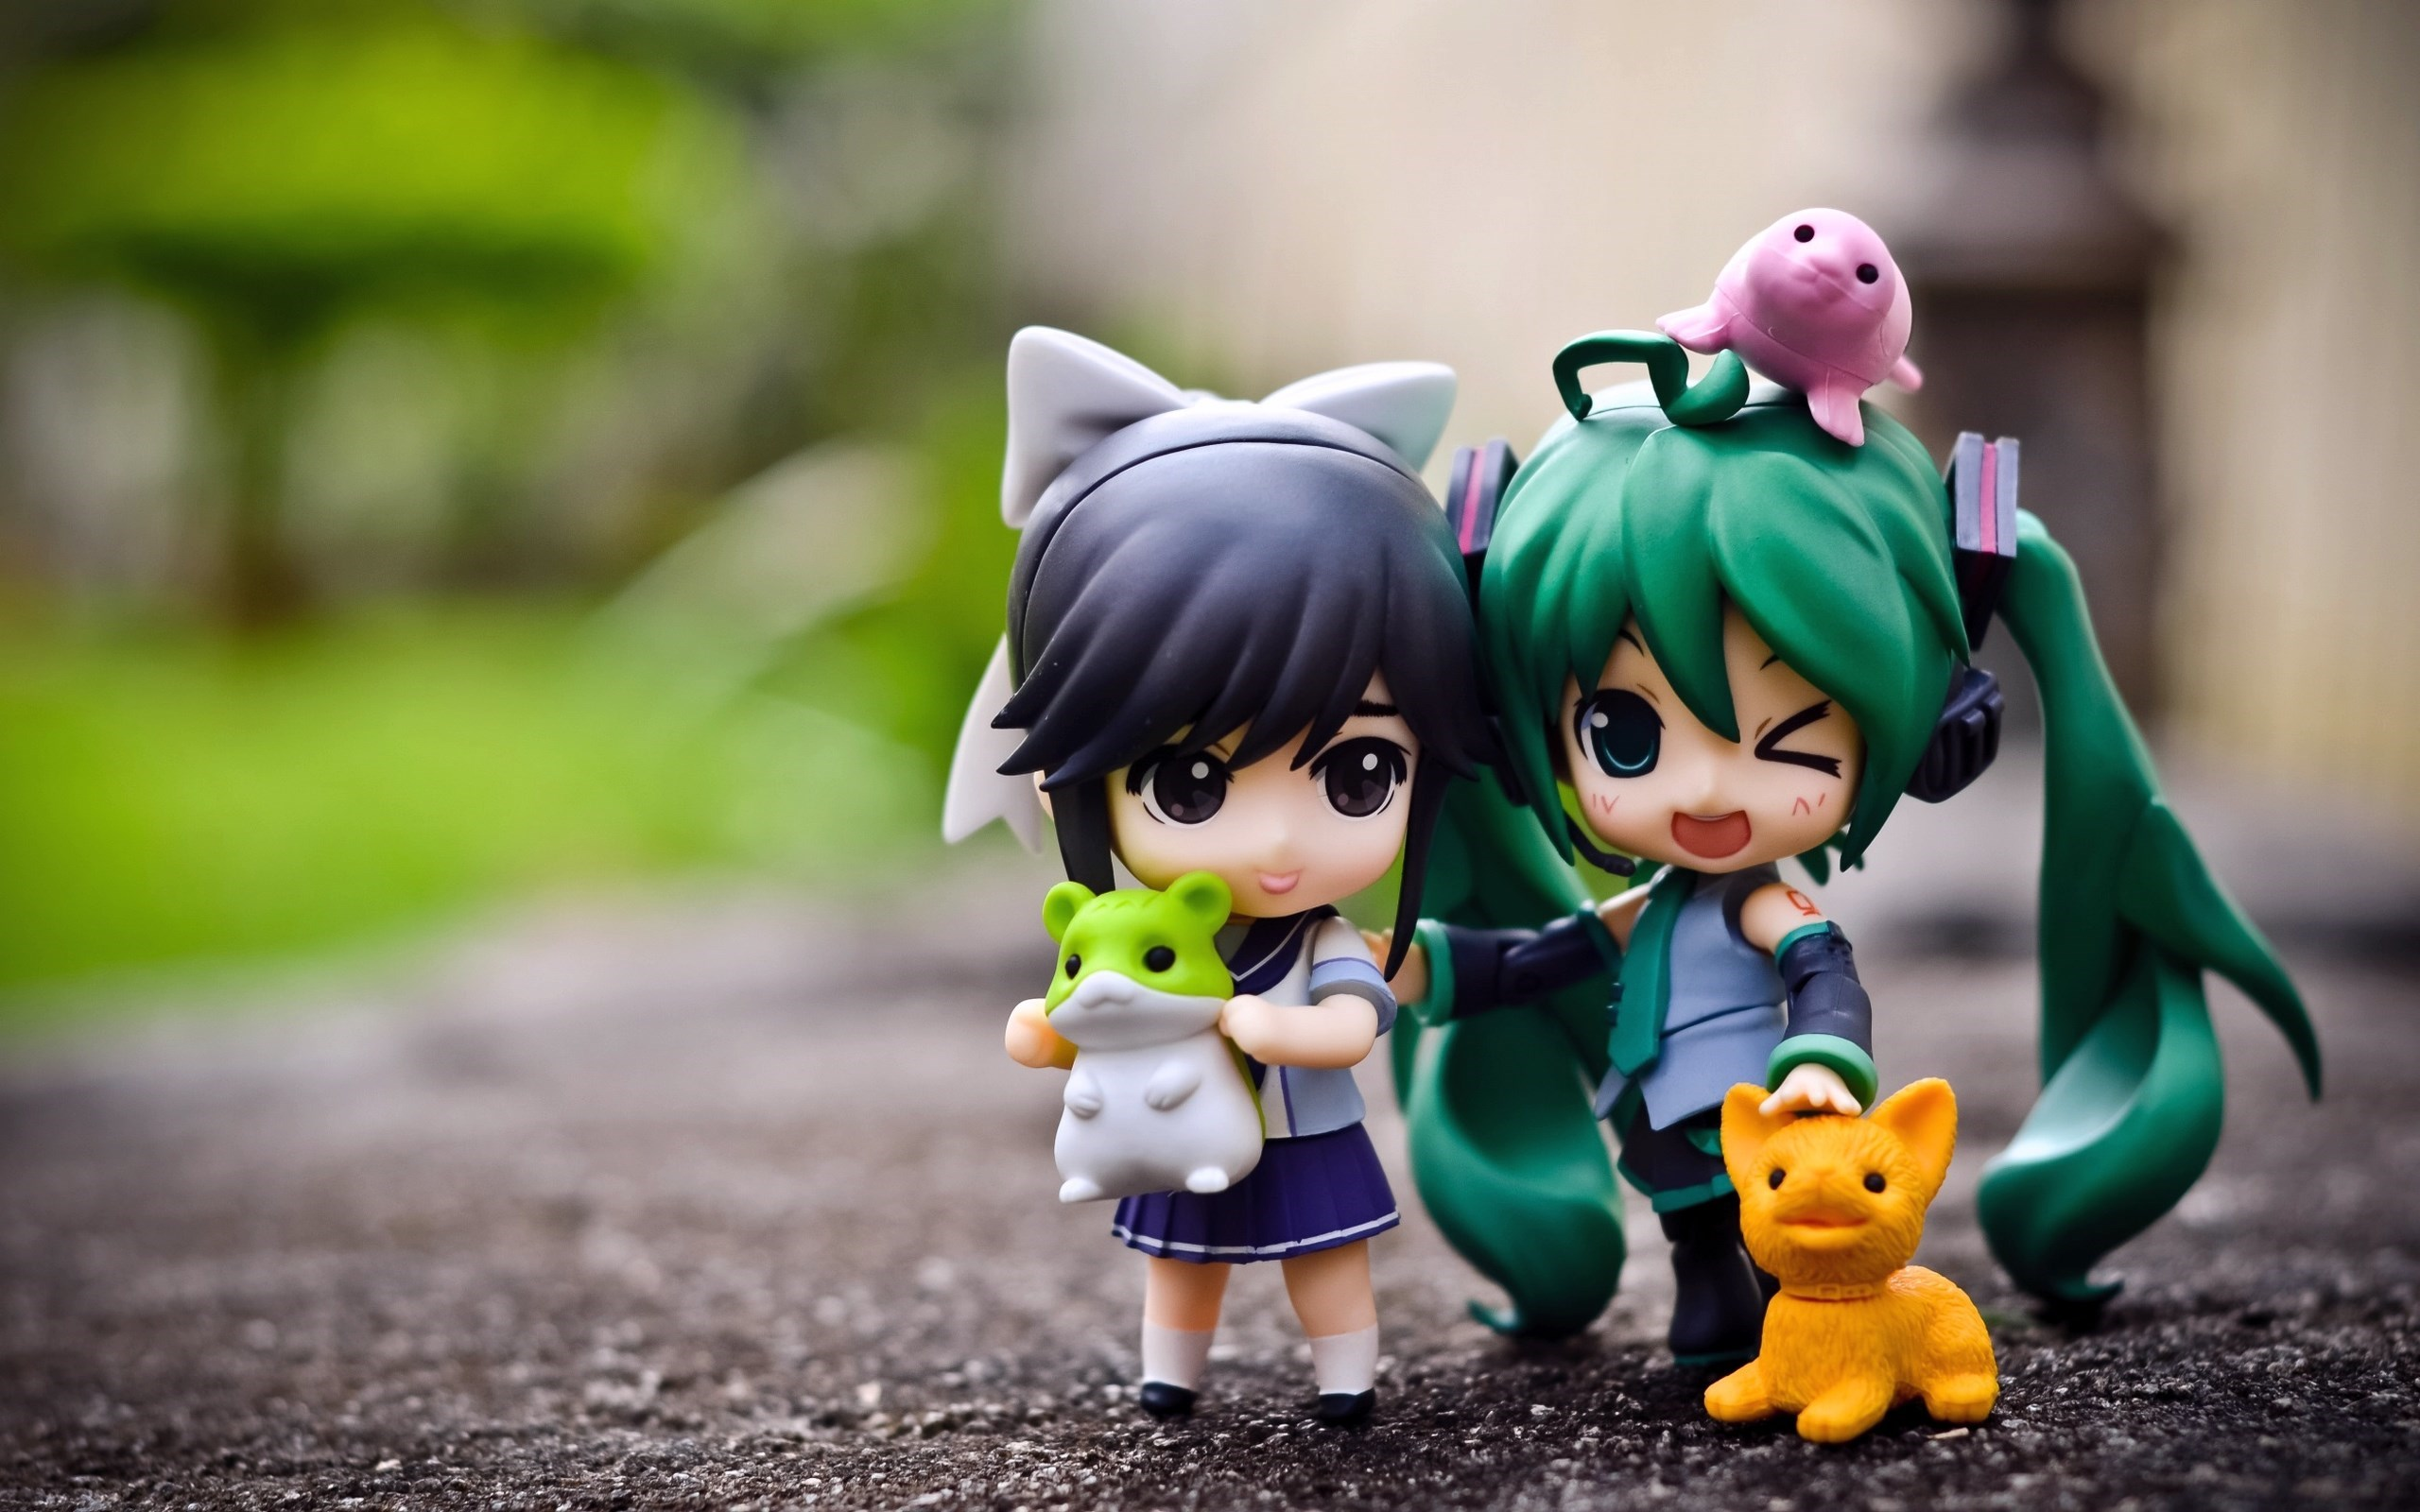 Dolls Anime Toys 6985996 2560x1600